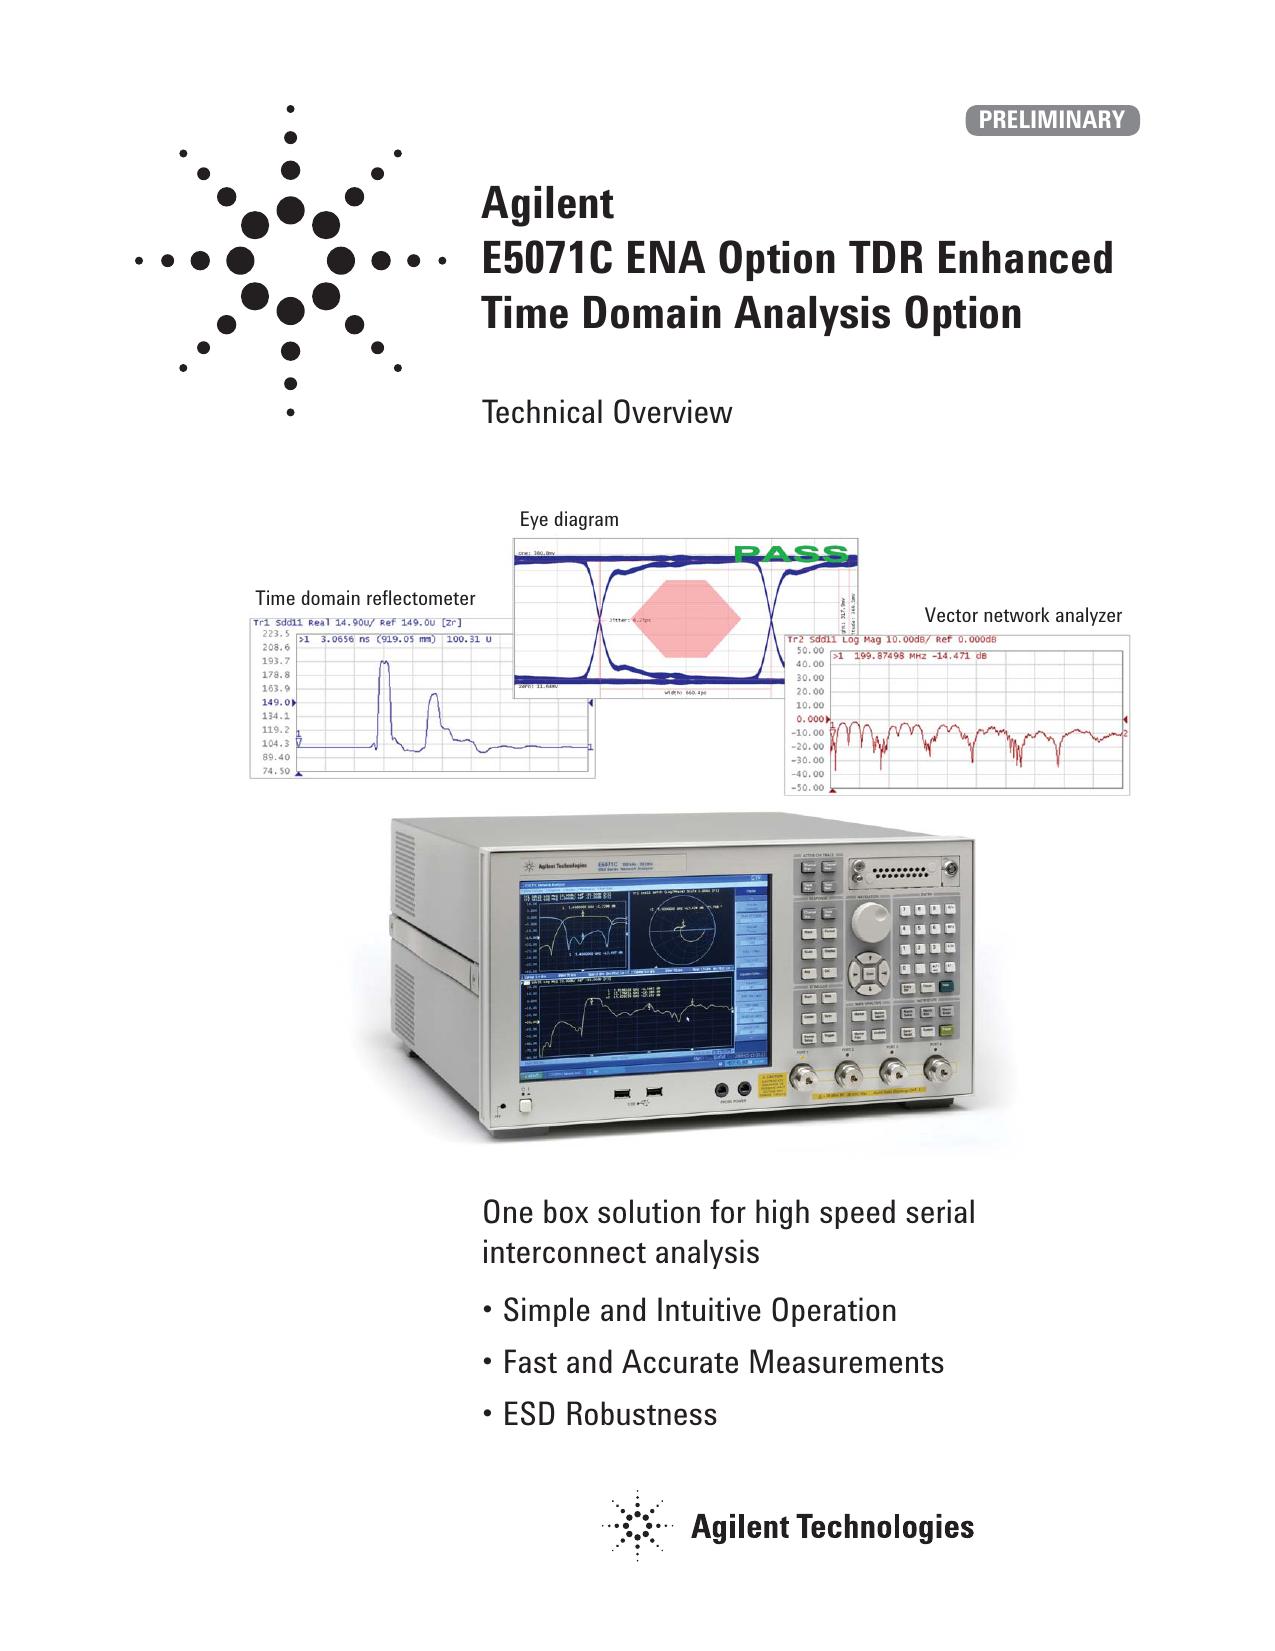 Agilent technologies e5071c instruction manual | manualzz.